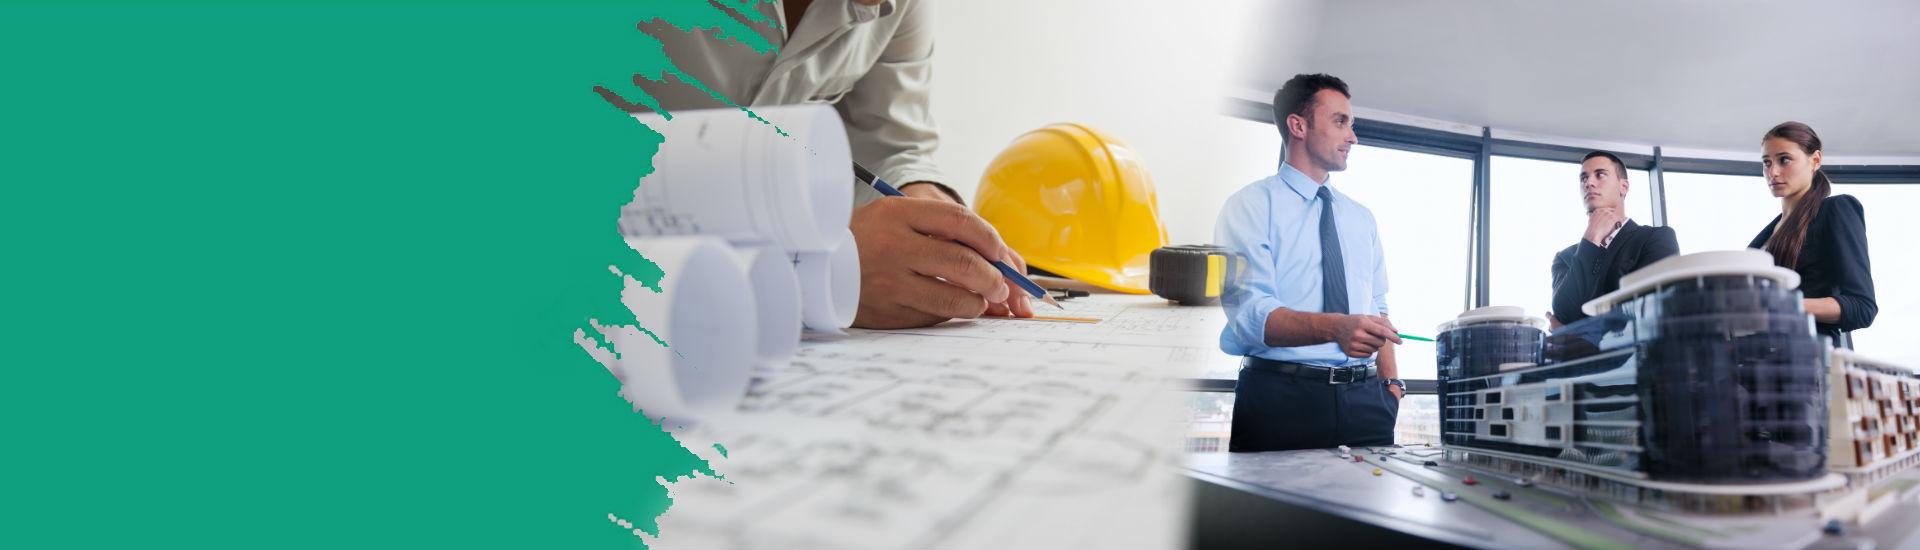 Construction Recruitment Team